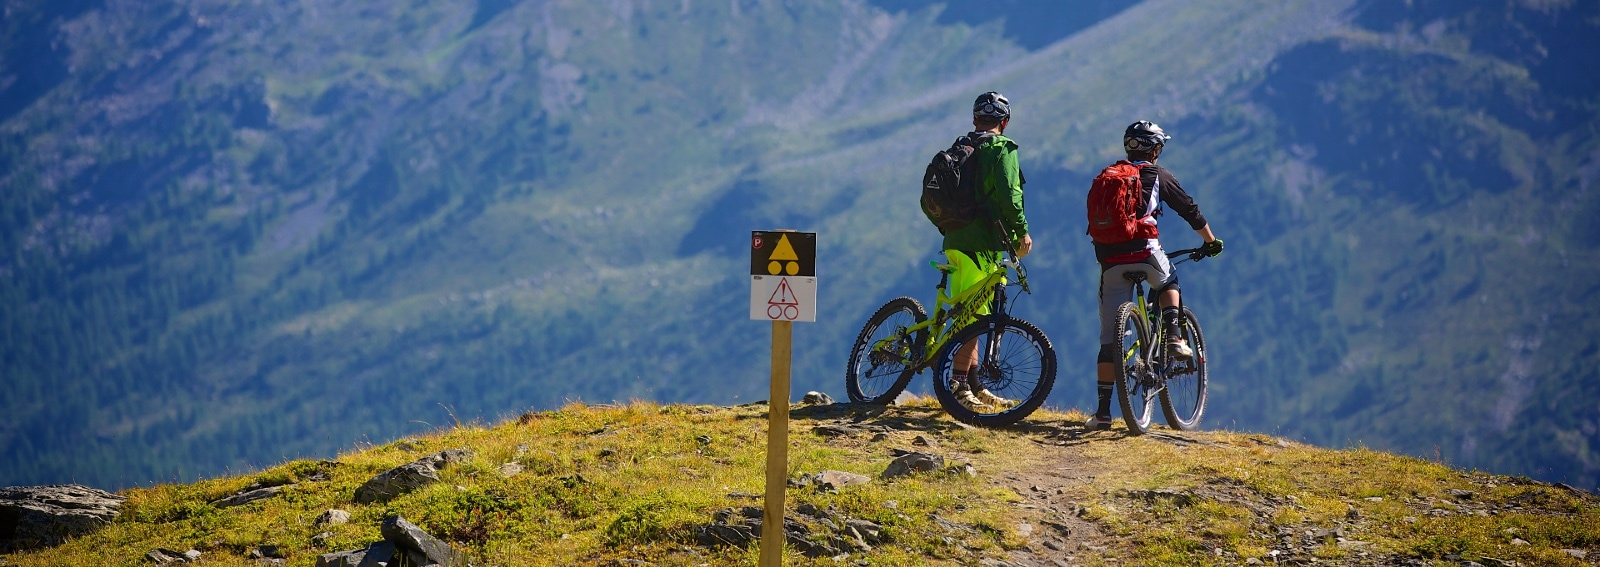 LA THUILE MTB_panorama RUTOR_La Thuile valle d'aosta-2